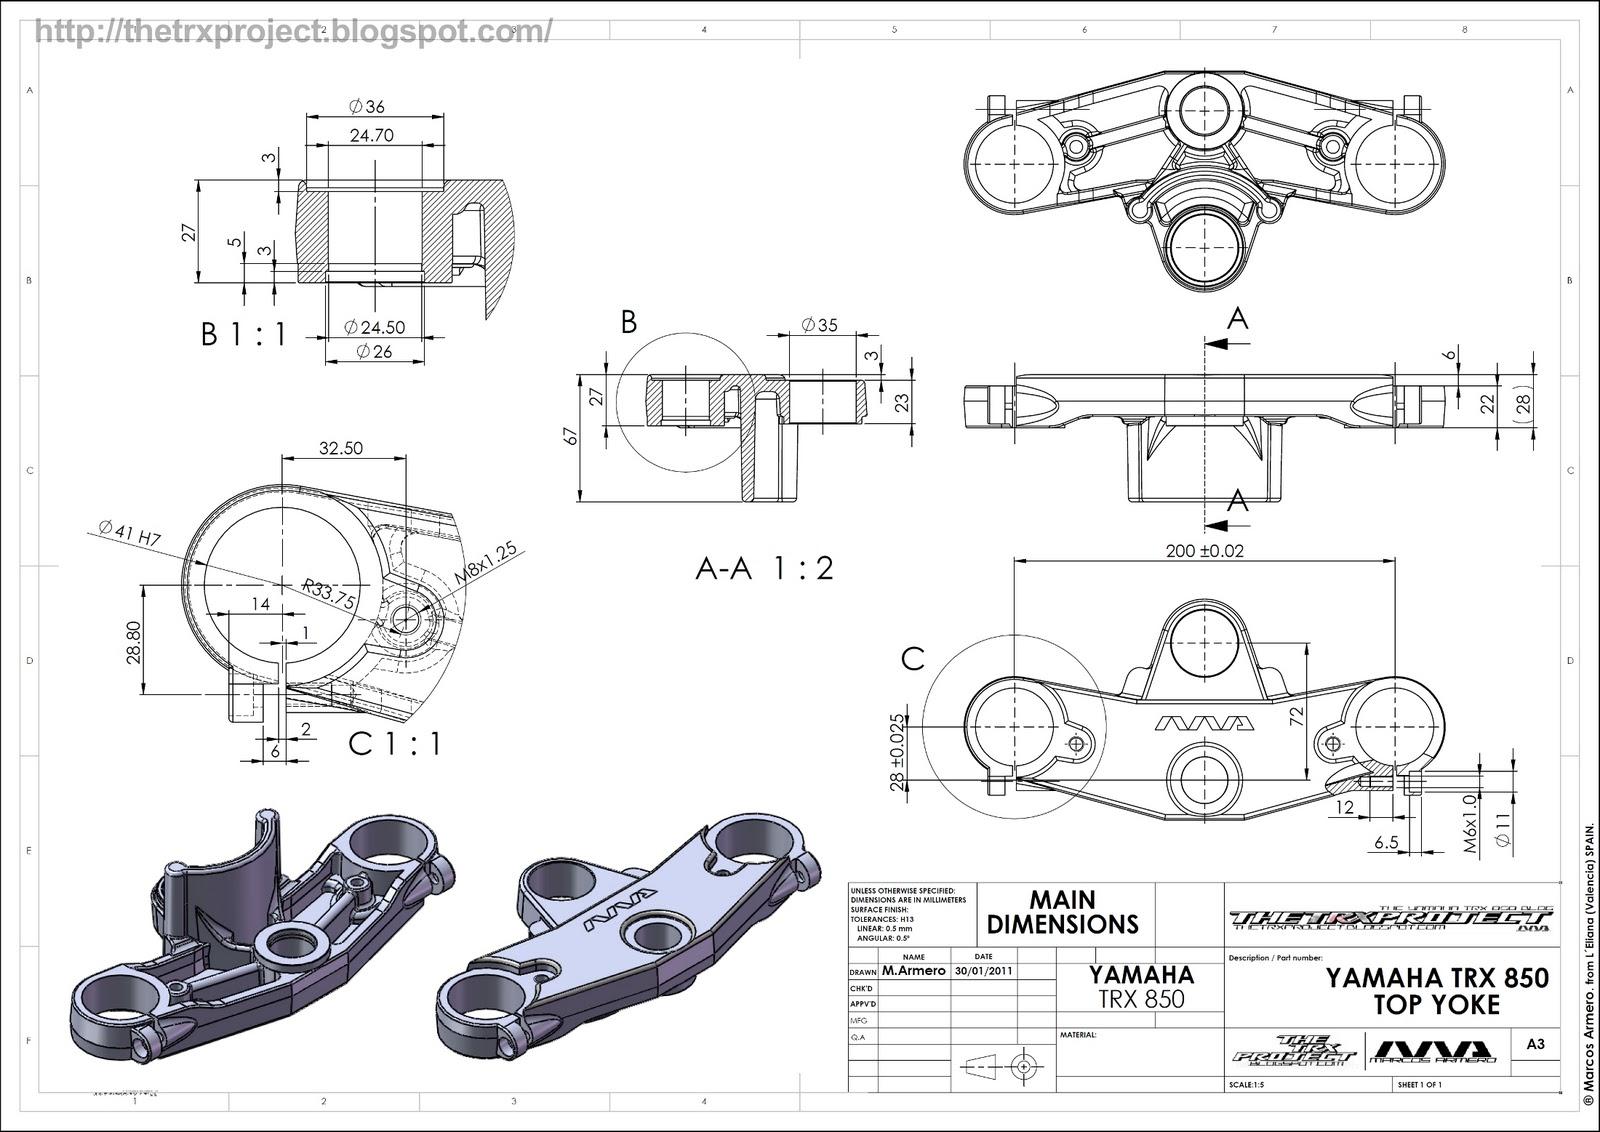 garage apron ideas - The TRX Project The Yamaha TRX 850 blog Yamaha TRX 850